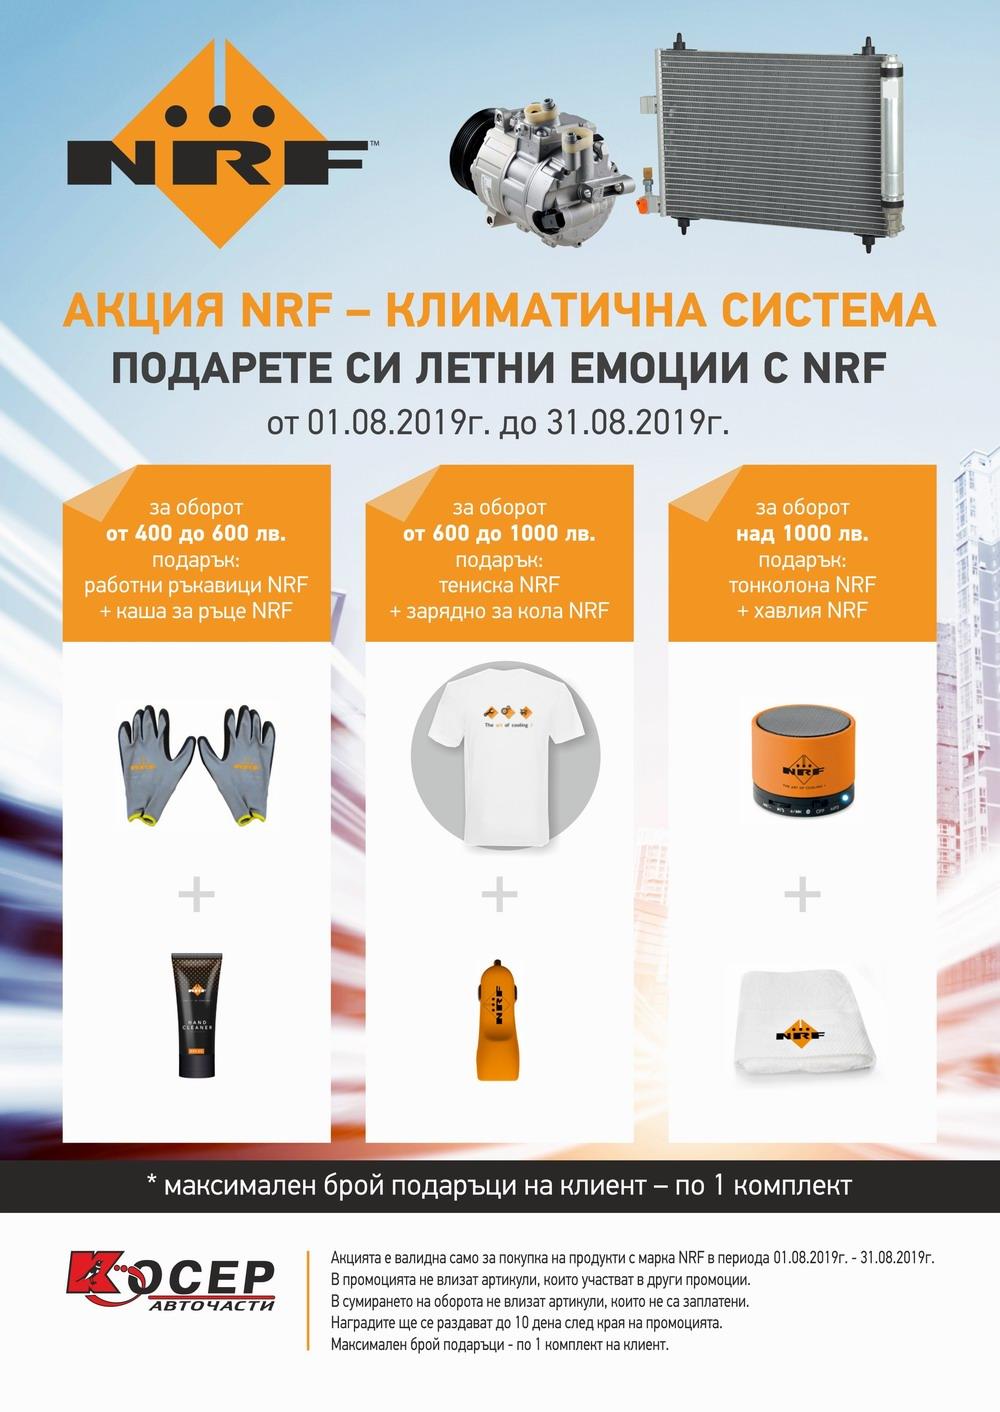 Промоция NRF, 01.08.2019 - 31.08.2019